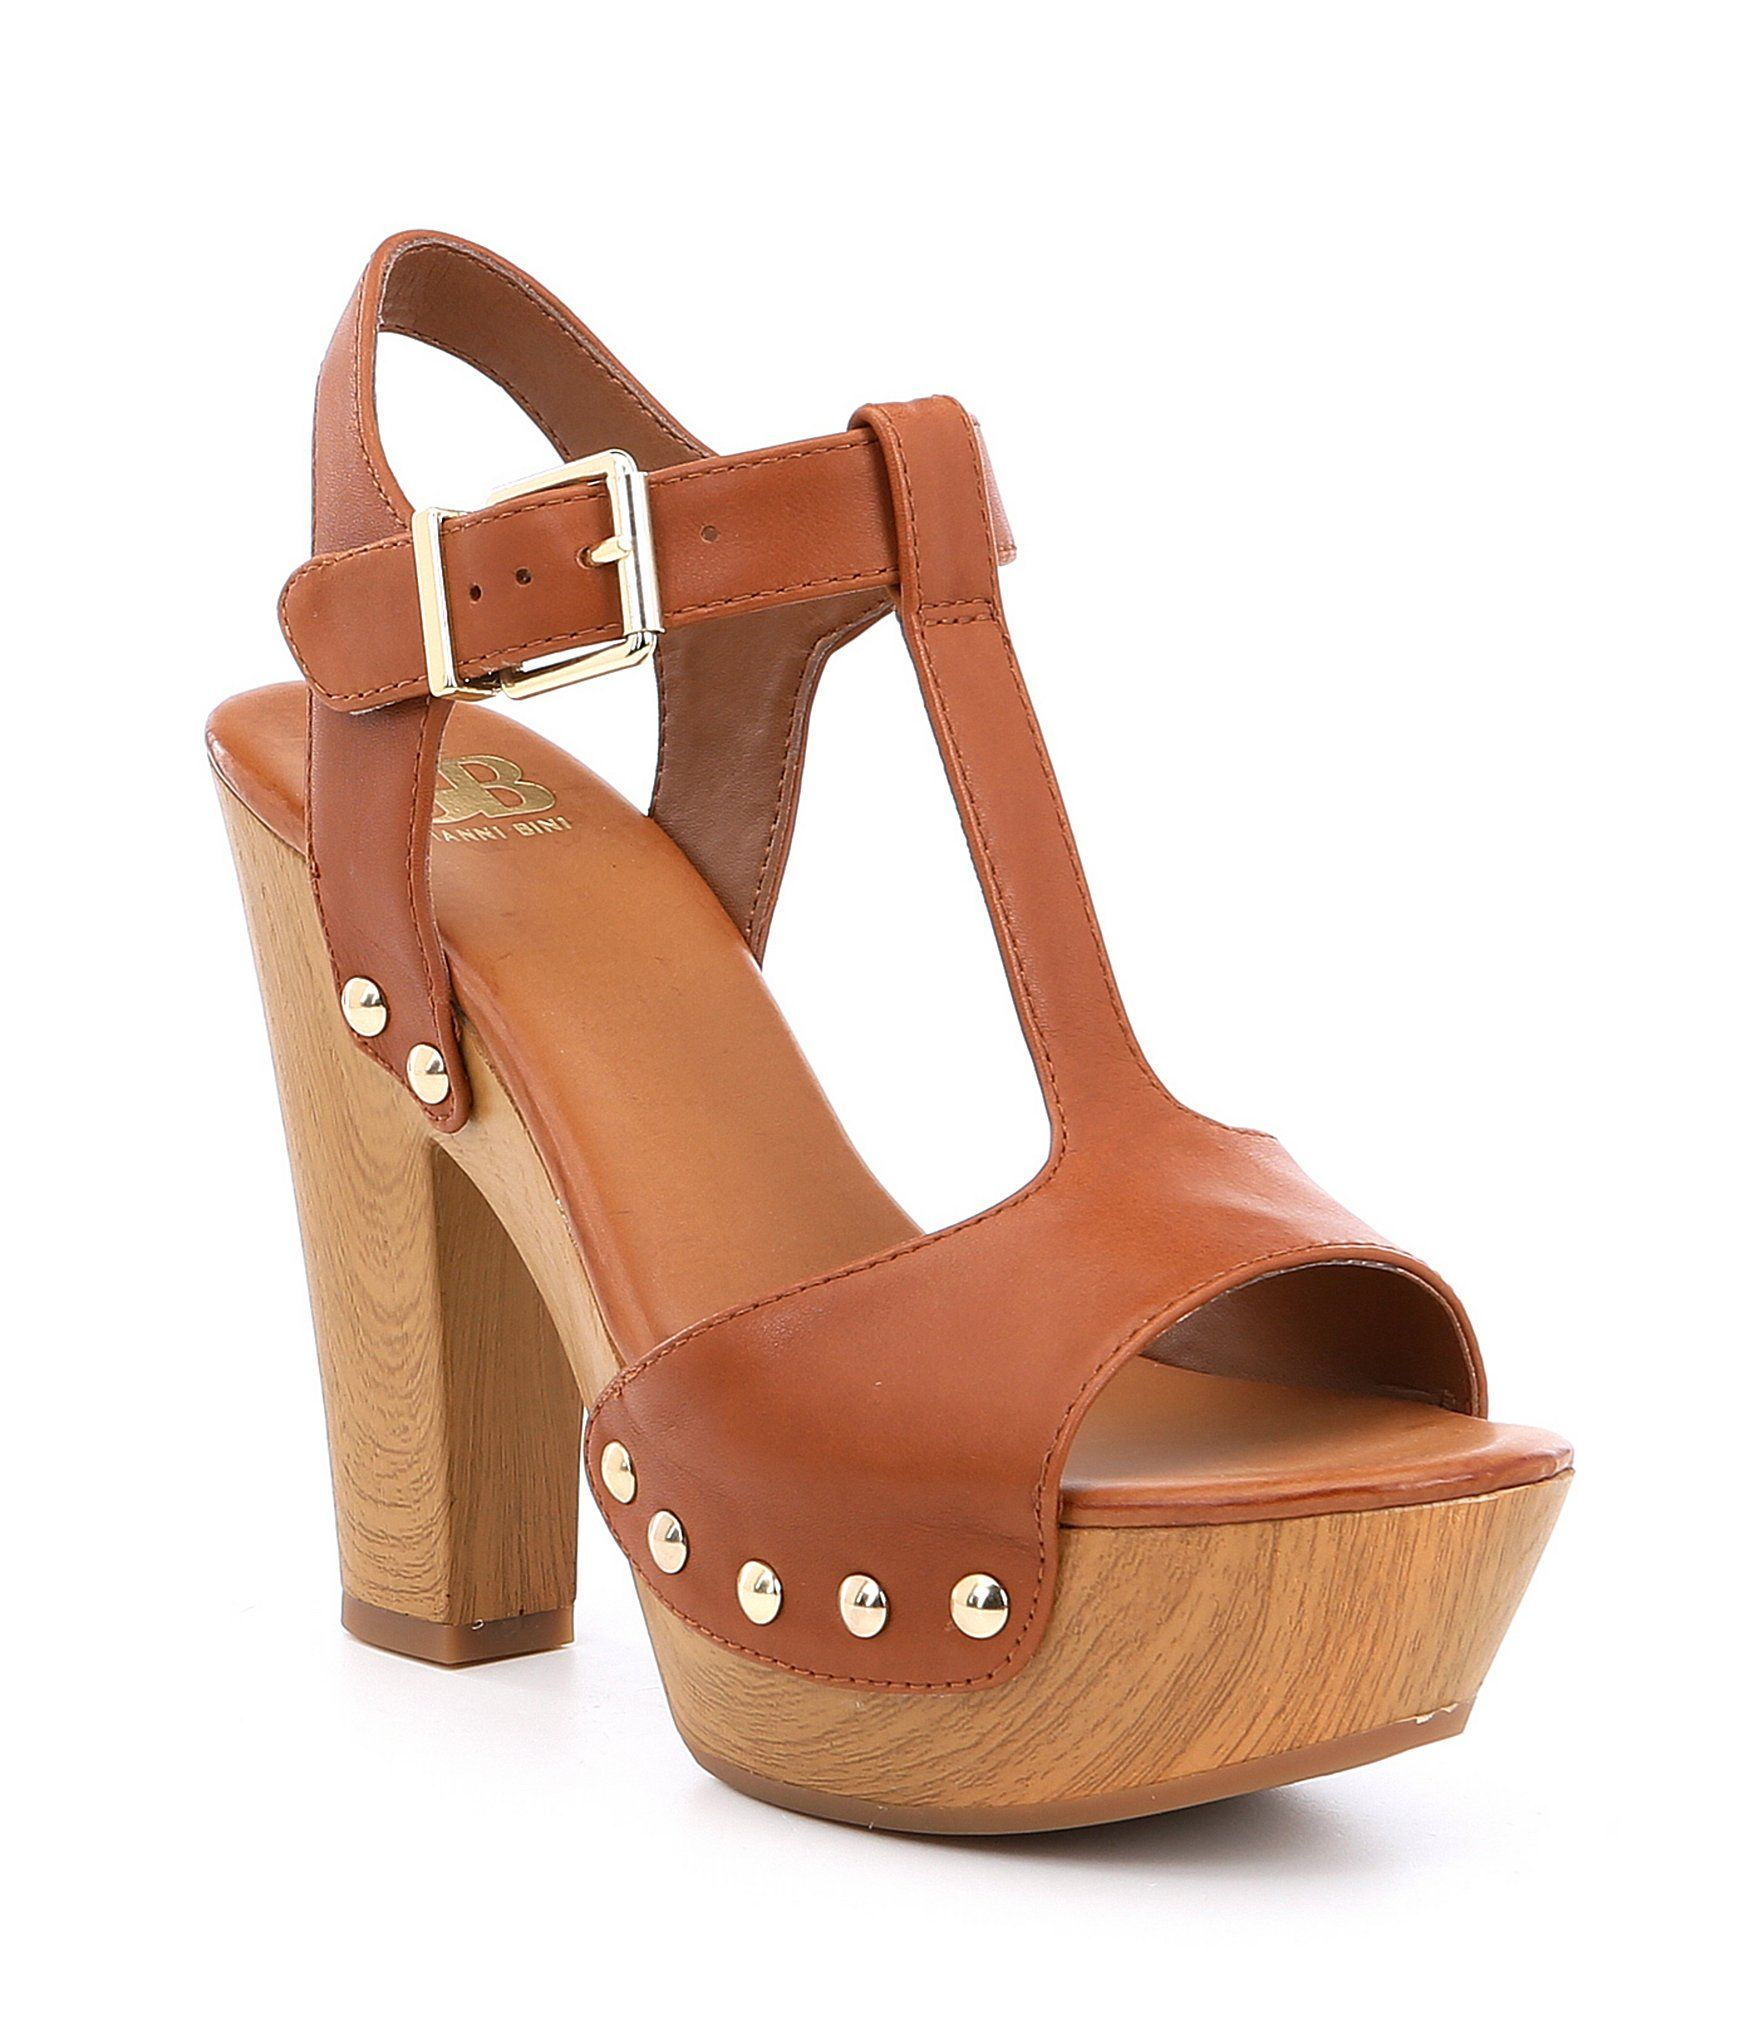 b9ad3e00c20 GB En-Chant Wood Platform Block Heel Dress Sandals | Style ...